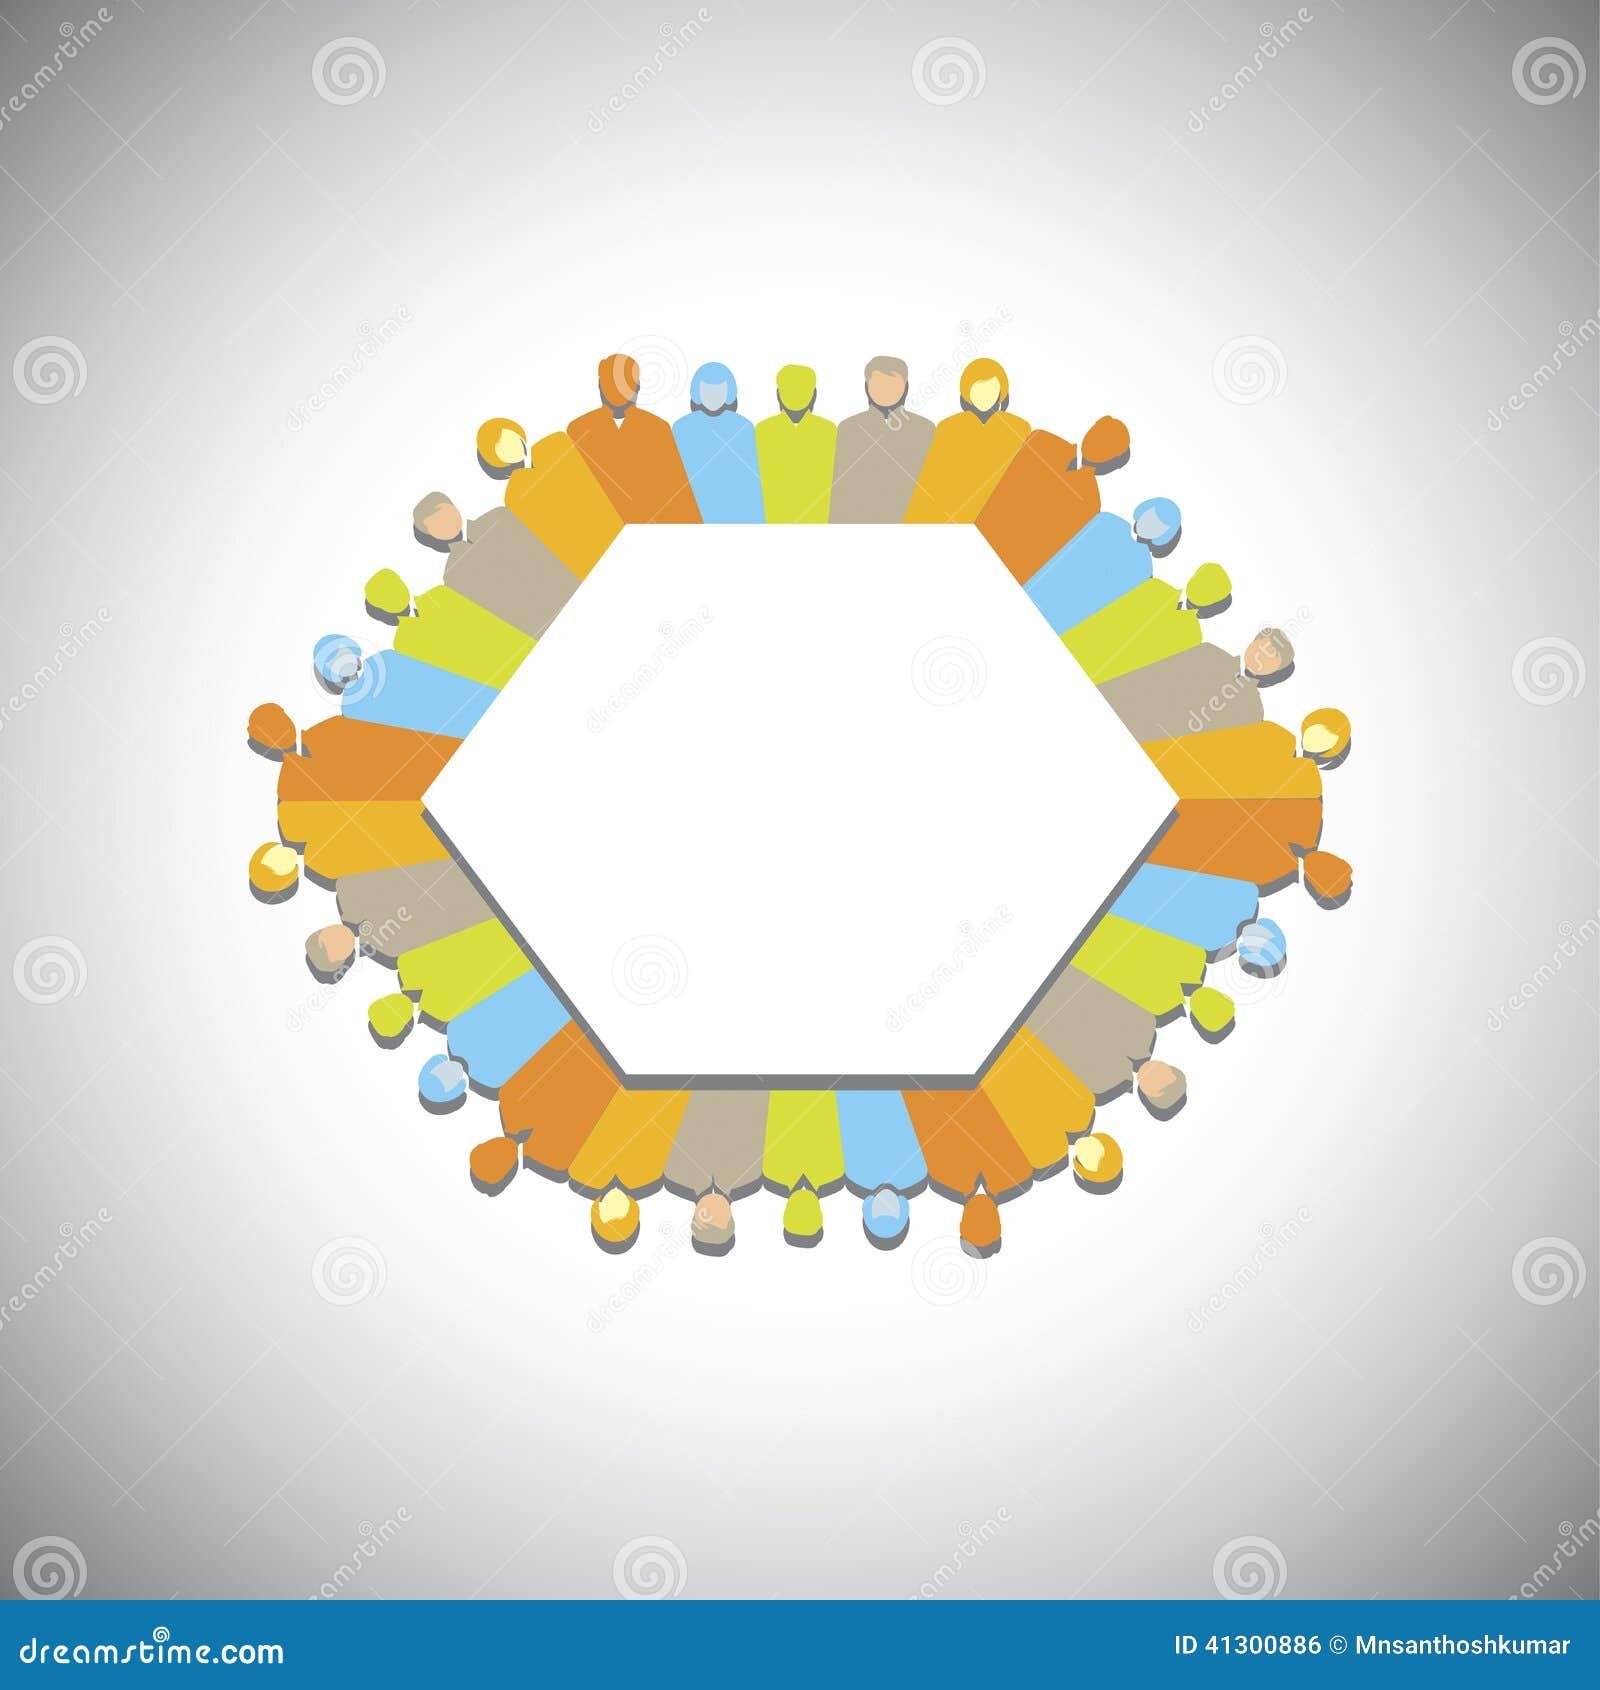 Social Network, Community, Executives Meeting - Concept ...